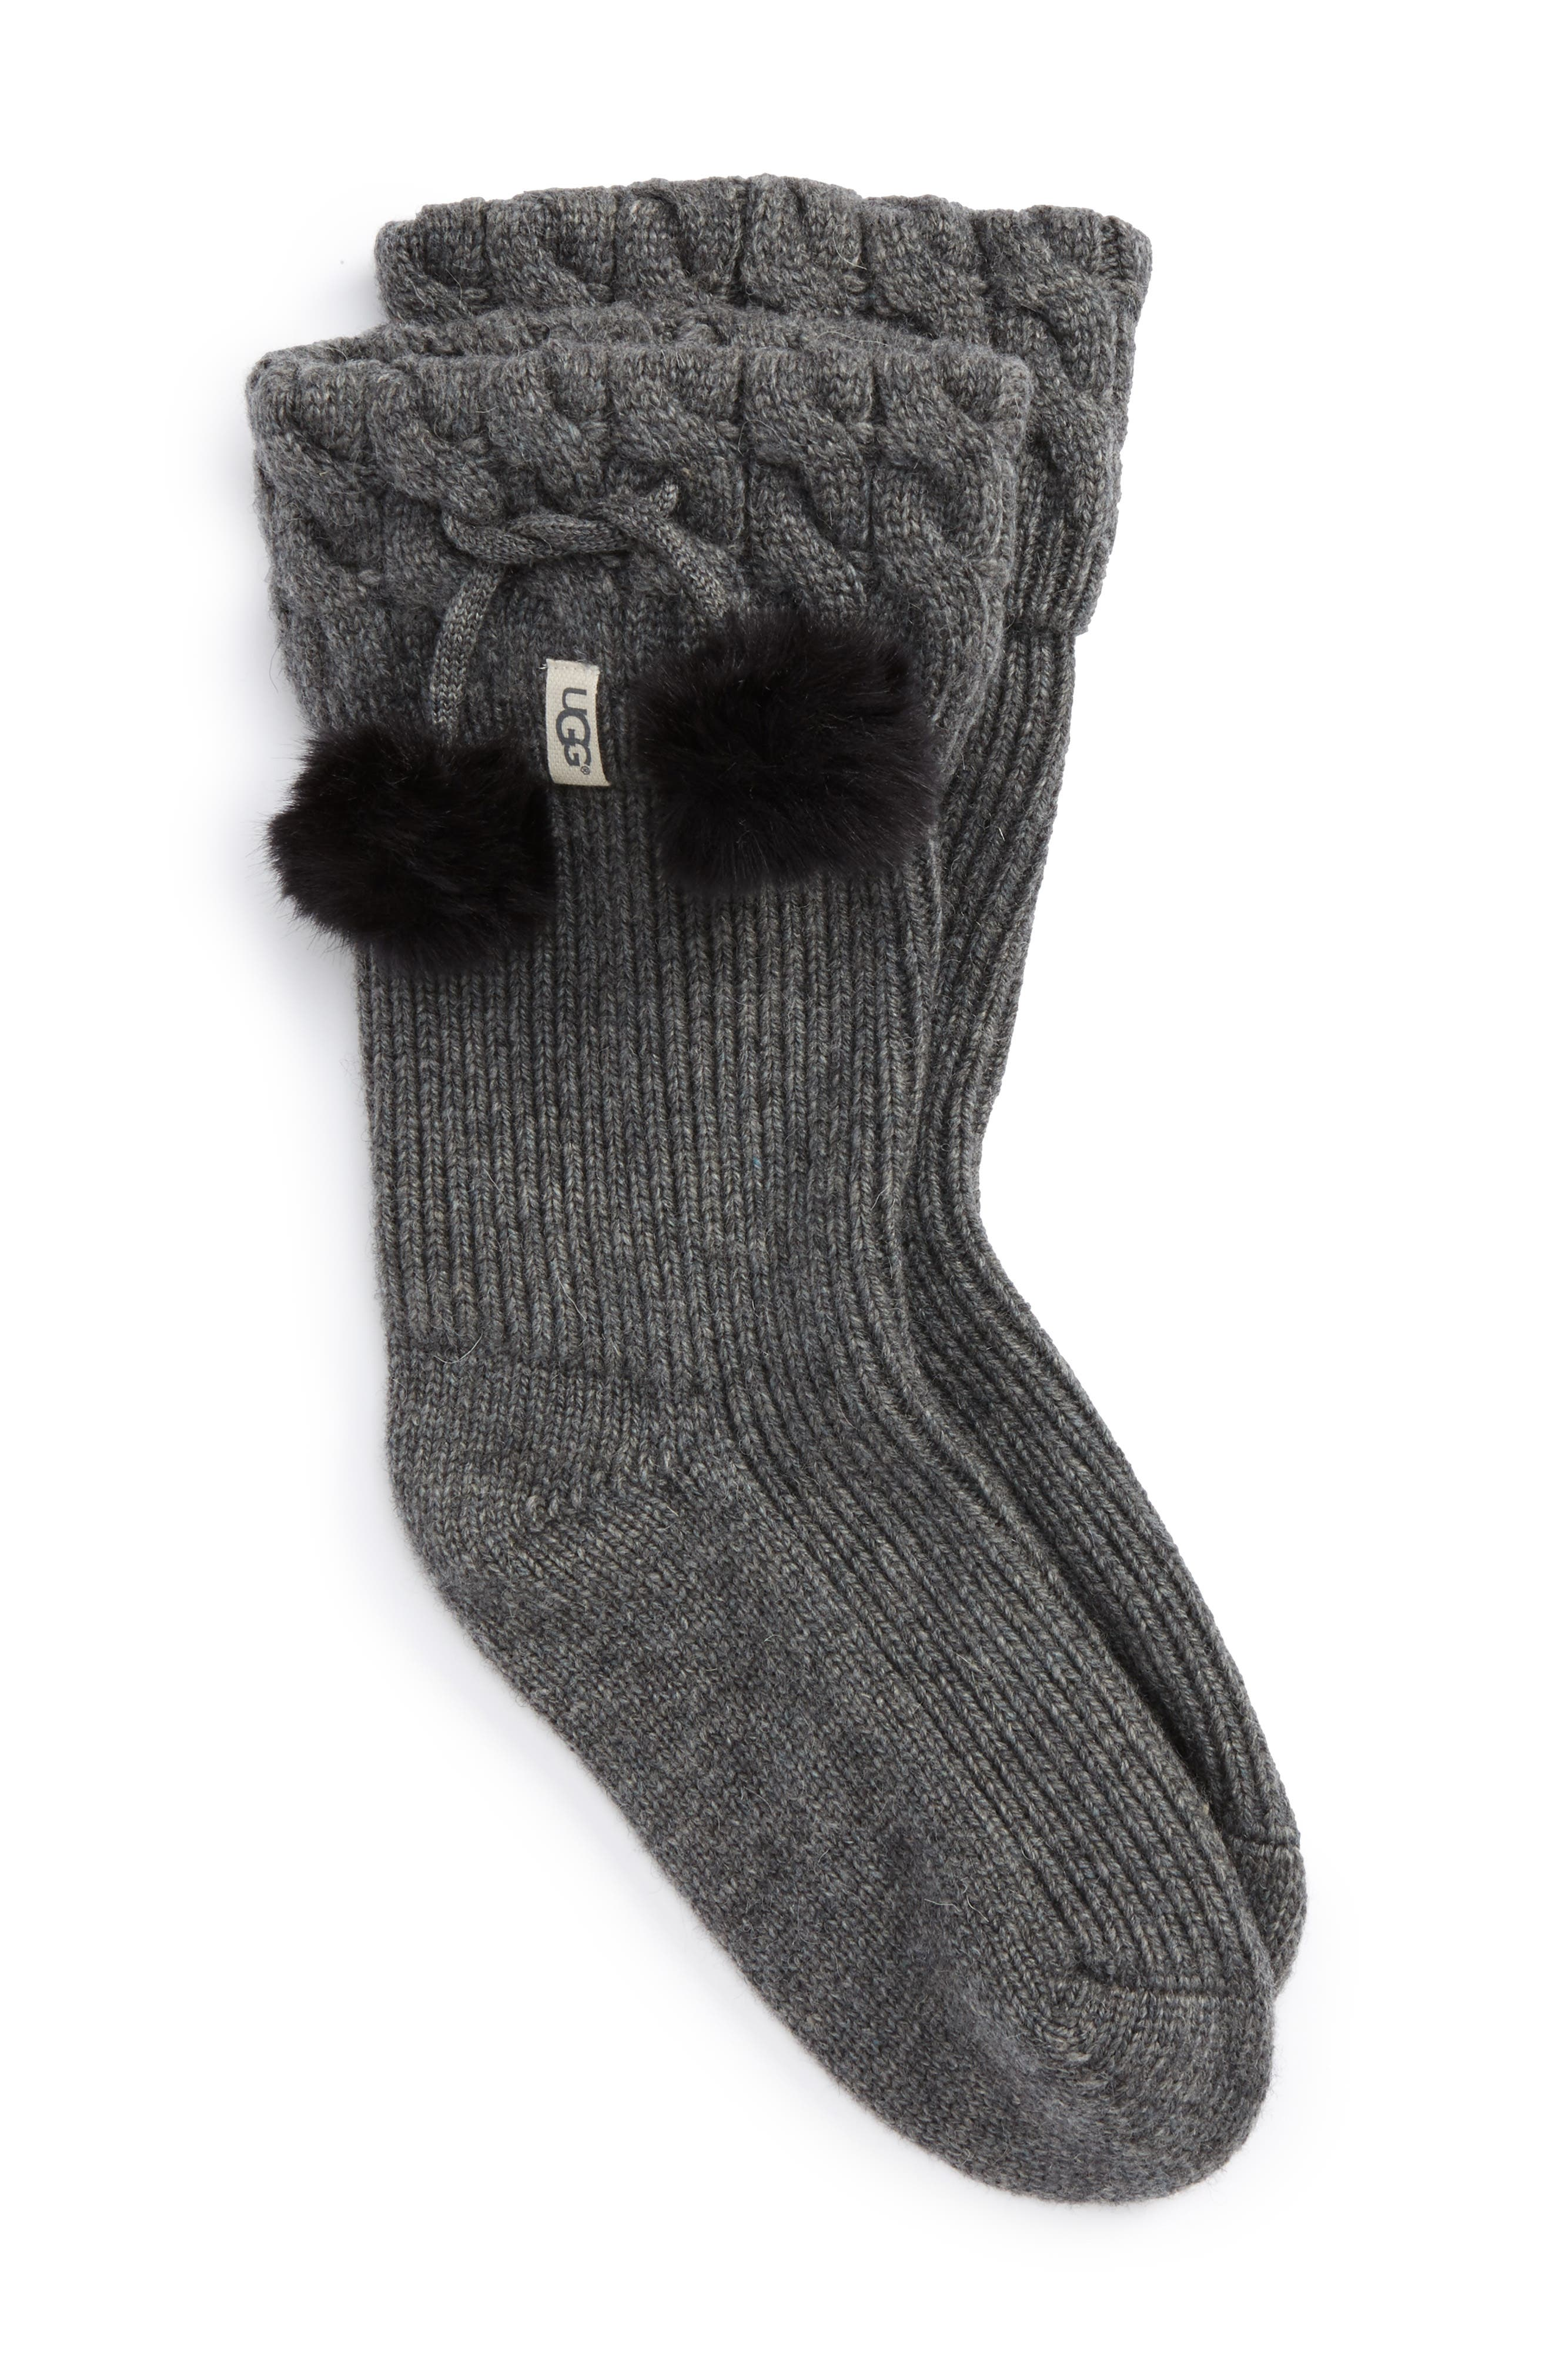 Alternate Image 1 Selected - UGG® UGGpure™ Pompom Short Rain Boot Sock (Women)